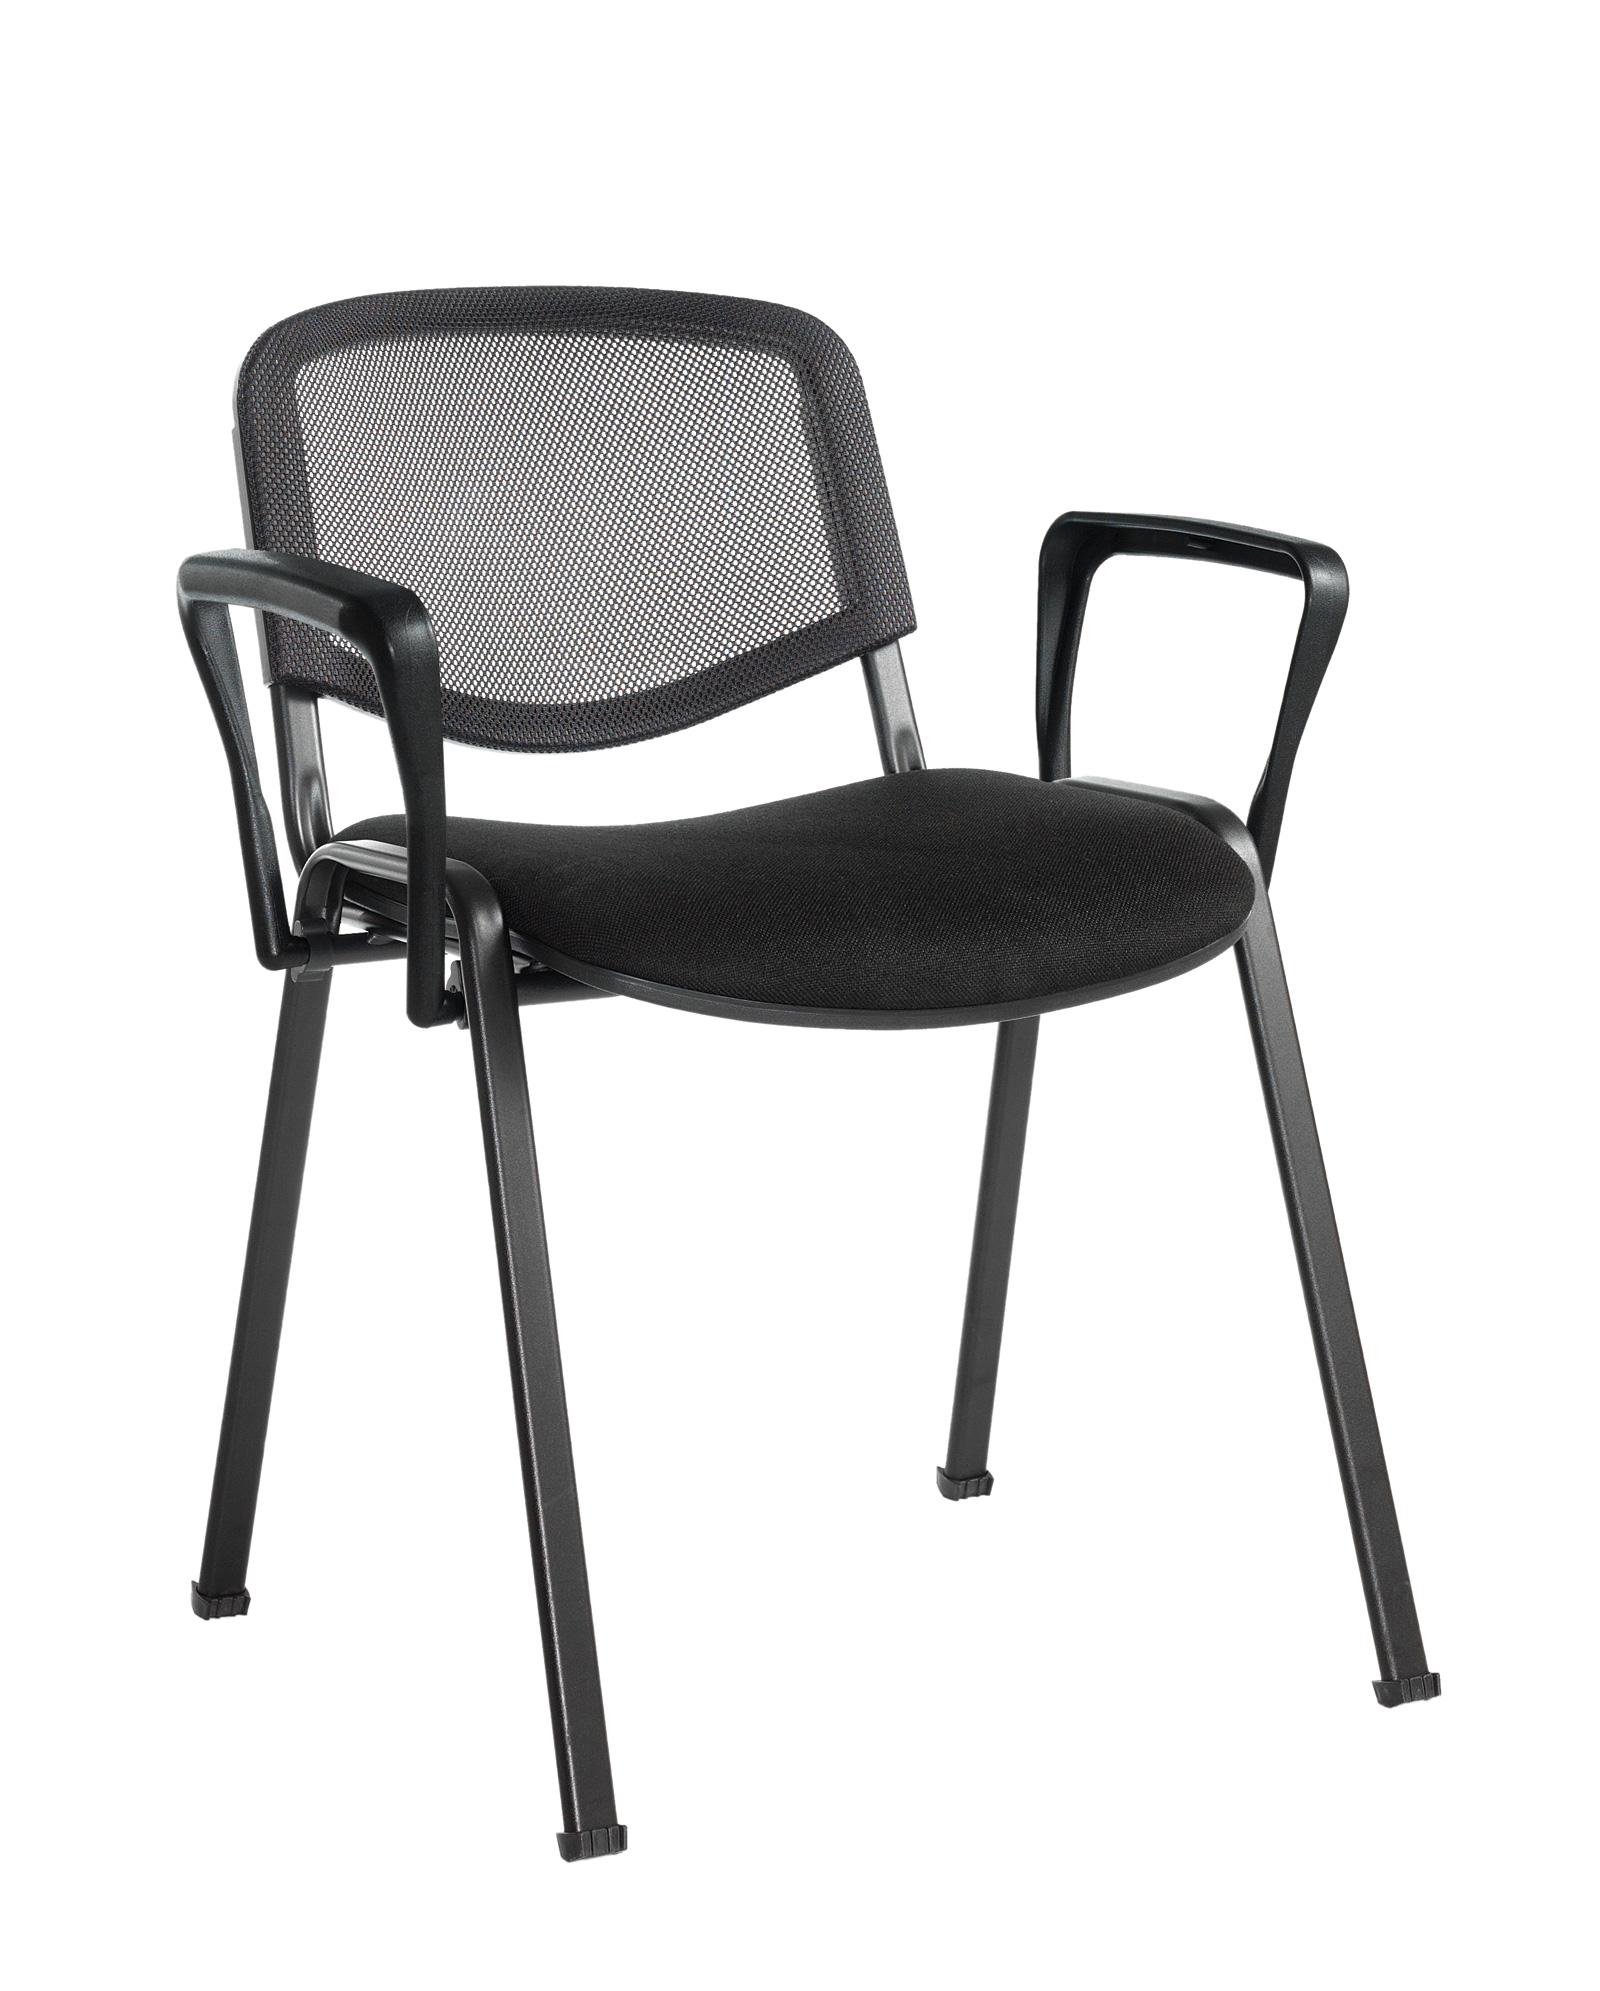 Taurus mesh back meeting room chair